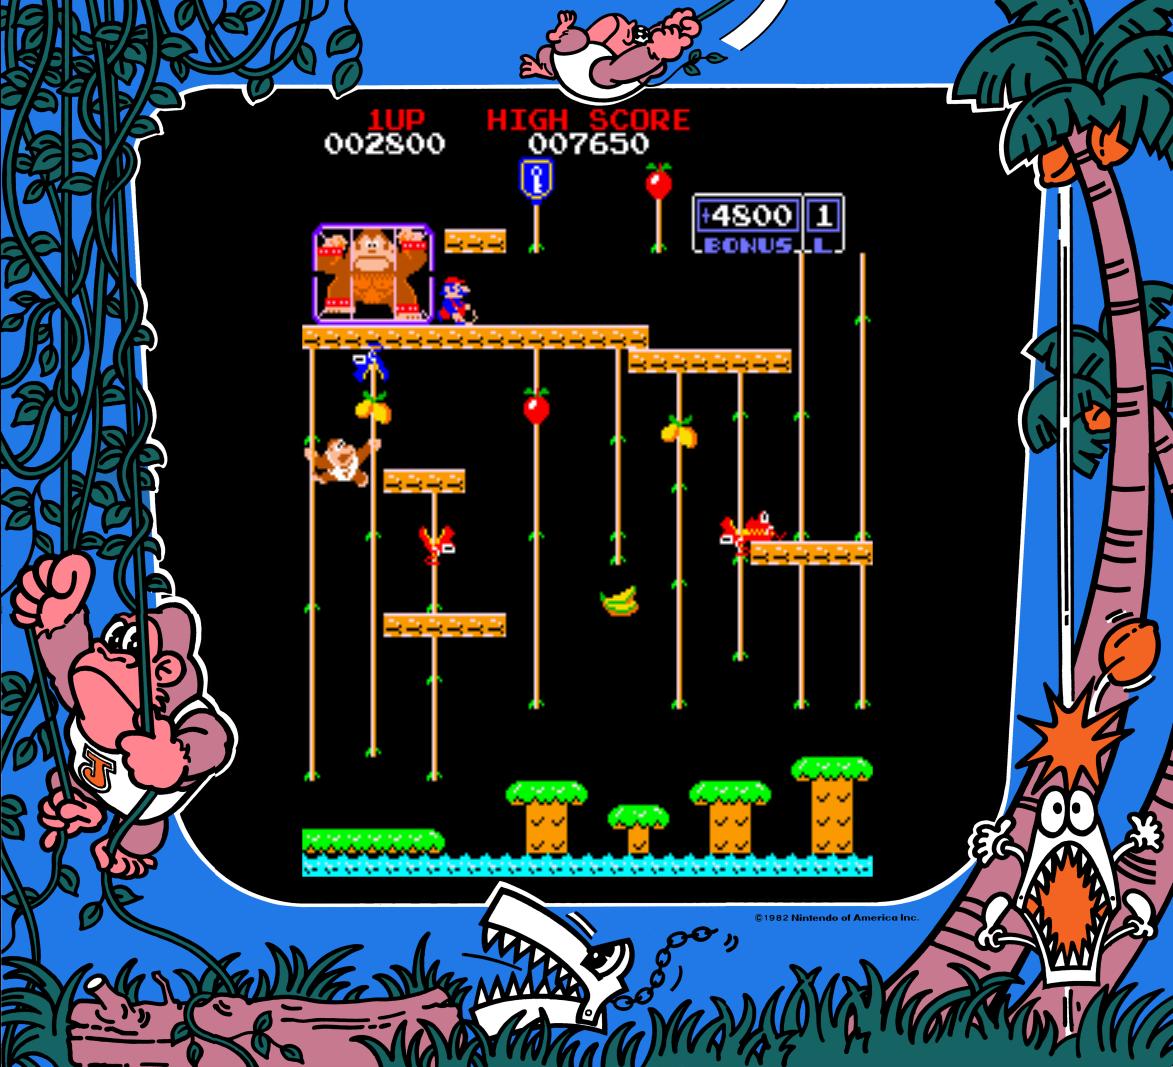 Screenshot of Donkey Kong Jr., an arcade video game by Nintendo 1982